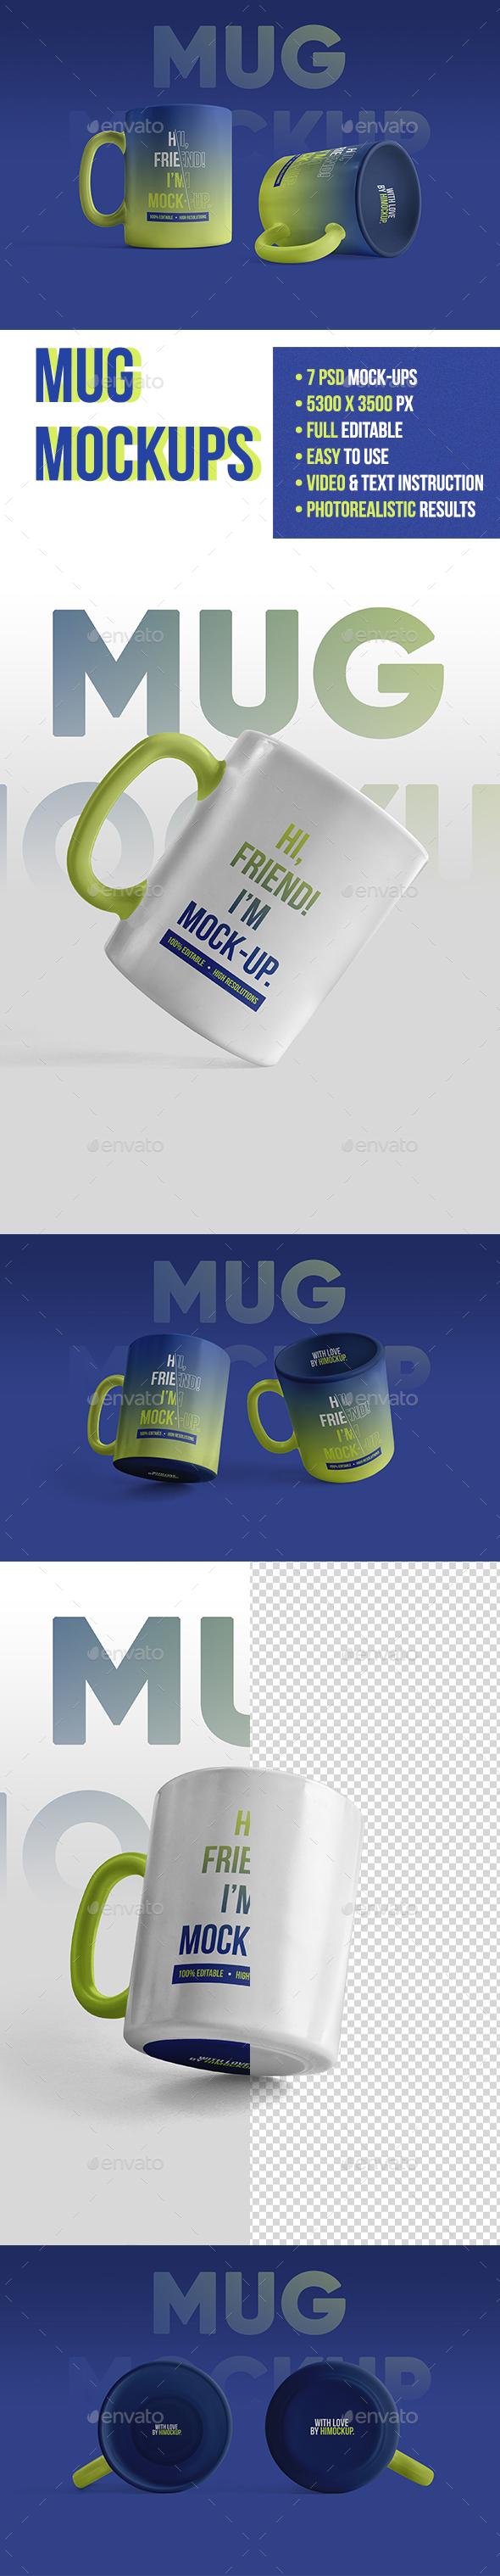 Mug Mockups - Food and Drink Packaging